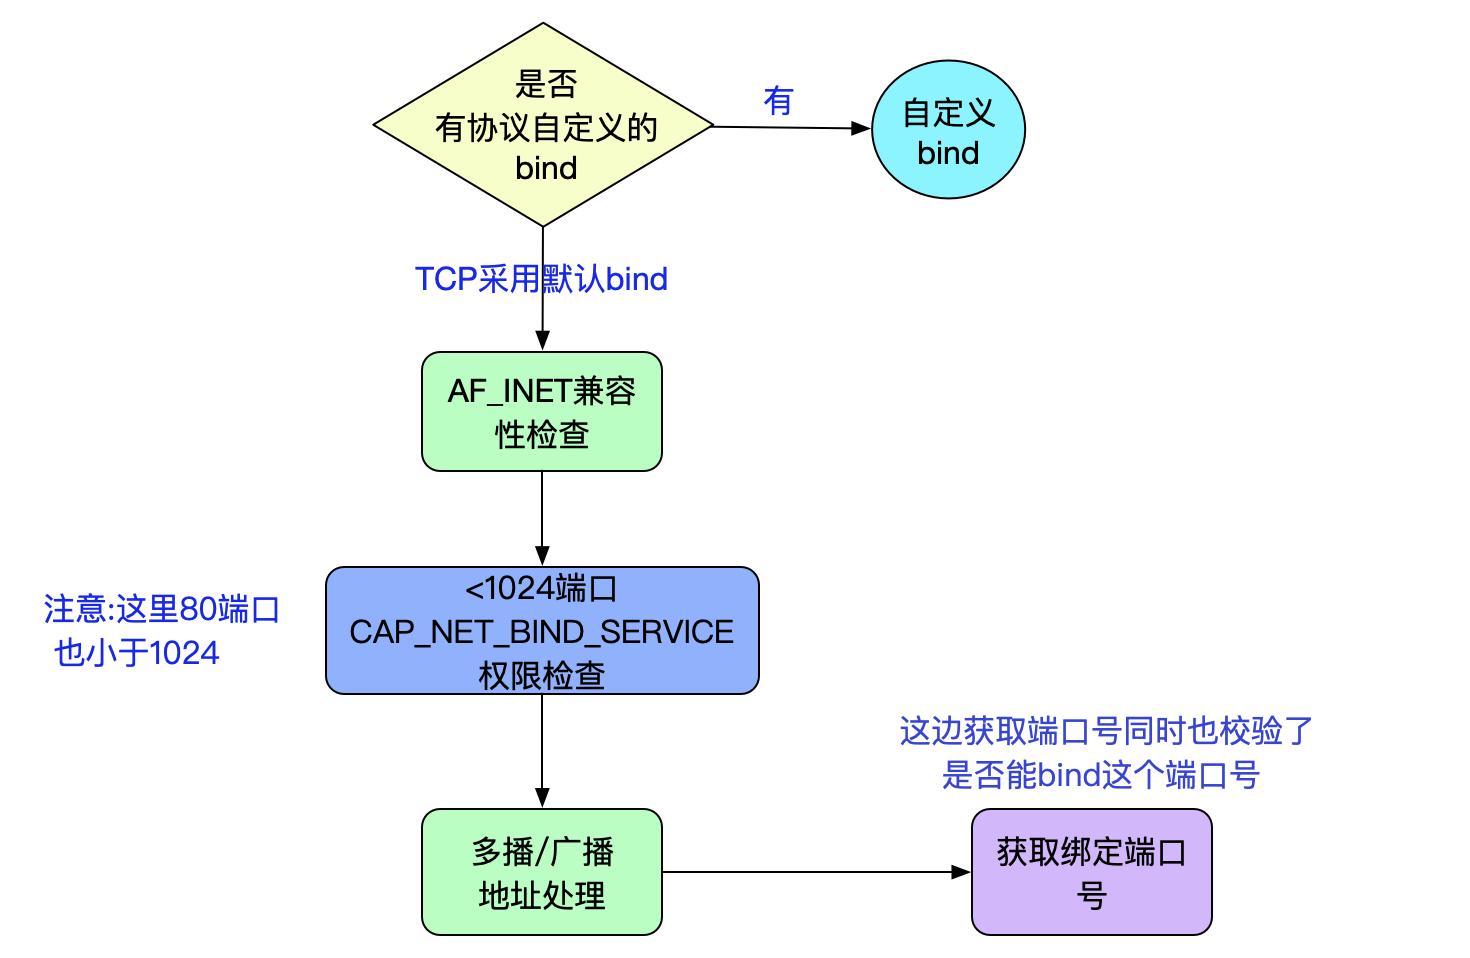 up 2645e7c88449b7ec797f3787385babd6ebd - 从Linux源码看Socket(TCP)的bind